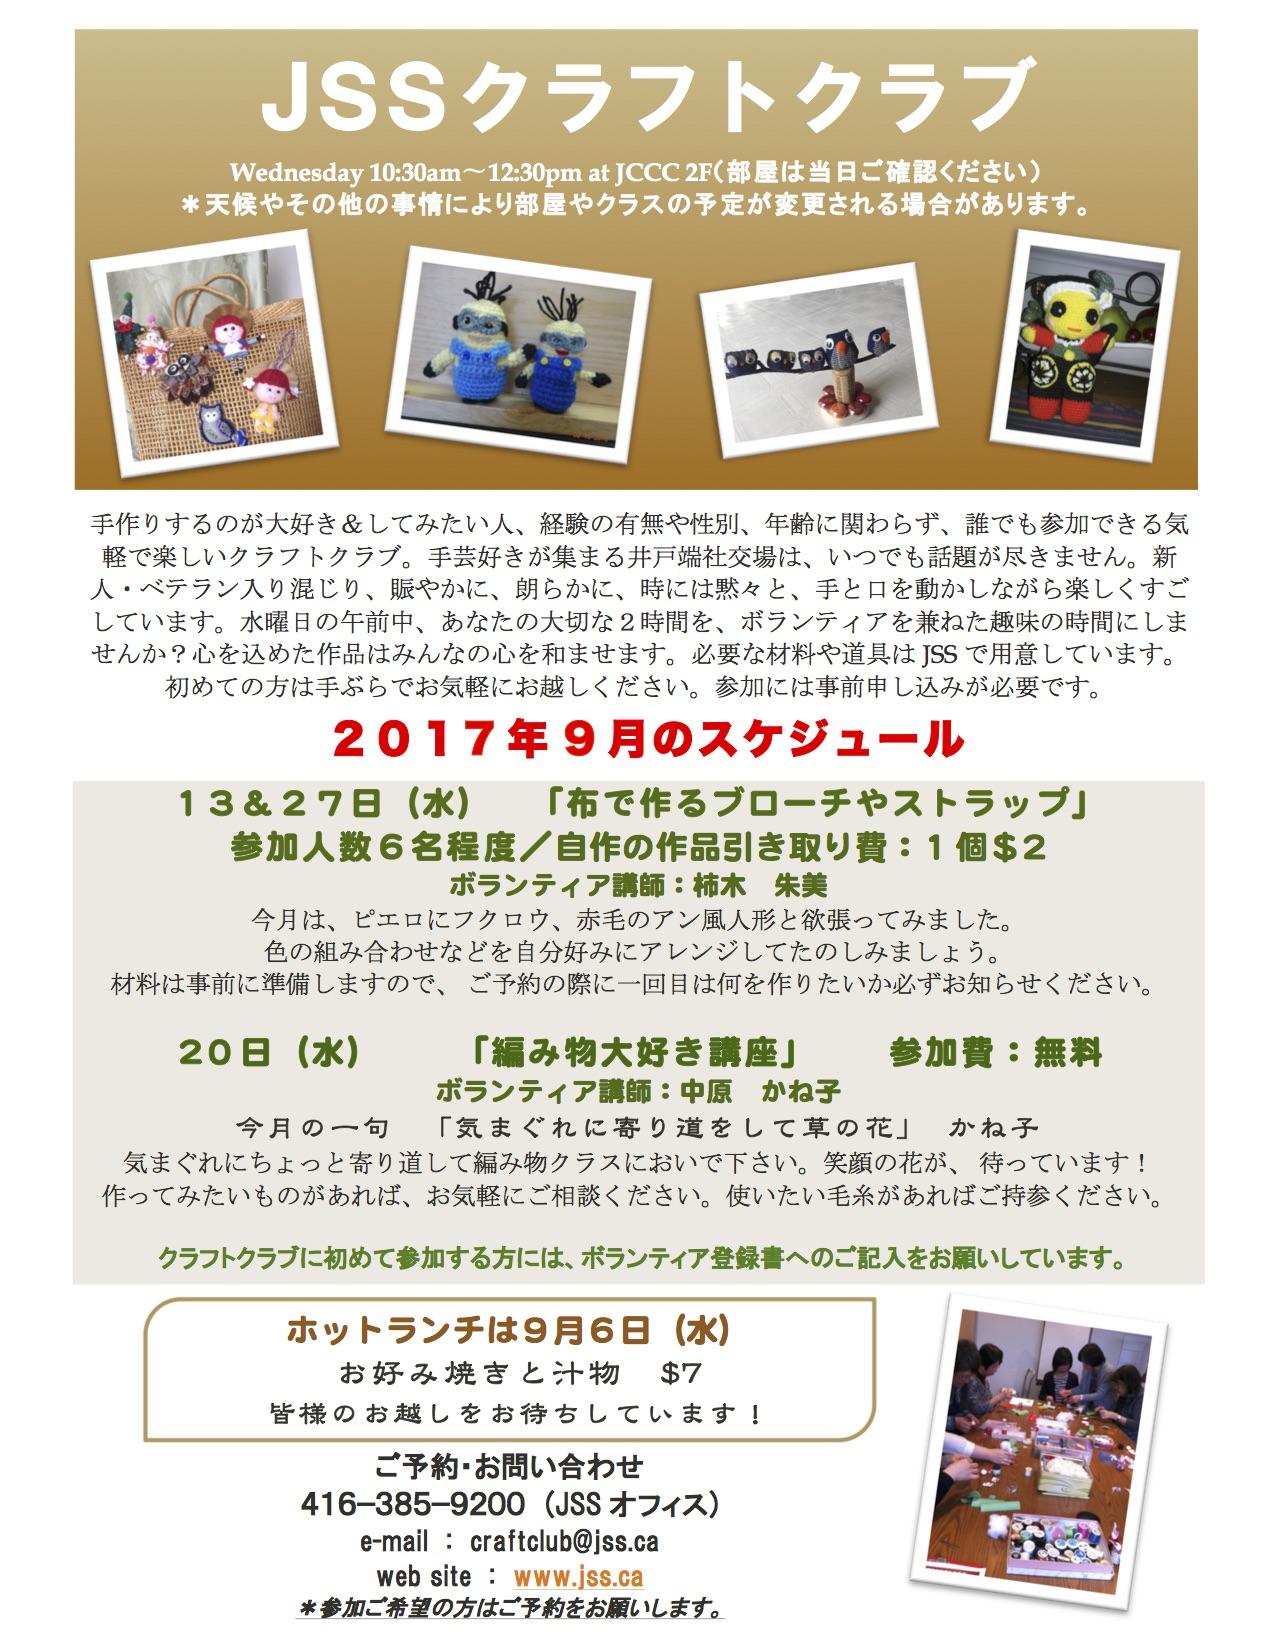 [:ja]JSS クラフトクラブ 9月の予定[:en]JSS Craft club September schedule[:]